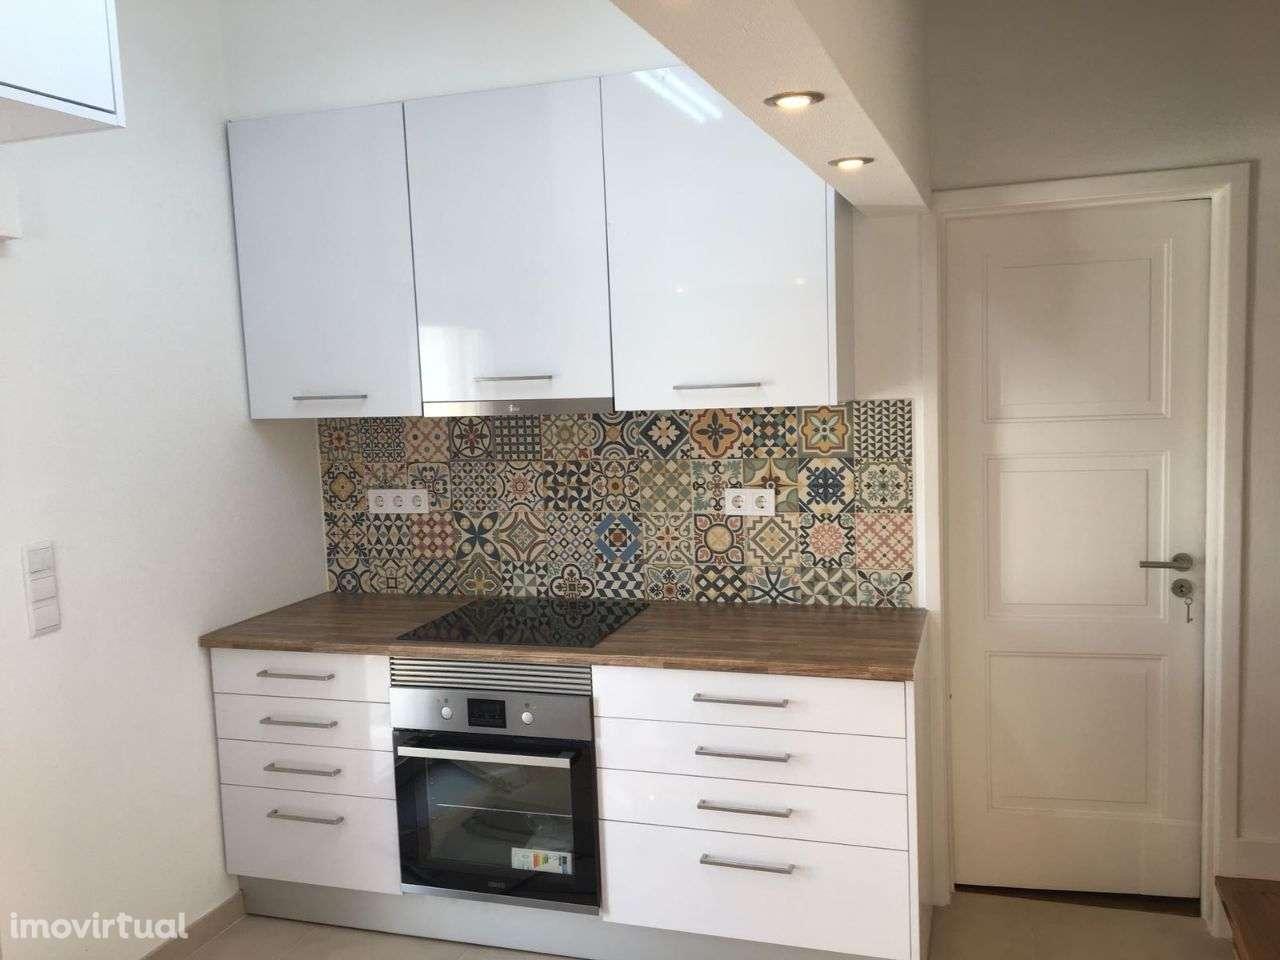 Moradia para arrendar, Olivais, Lisboa - Foto 6